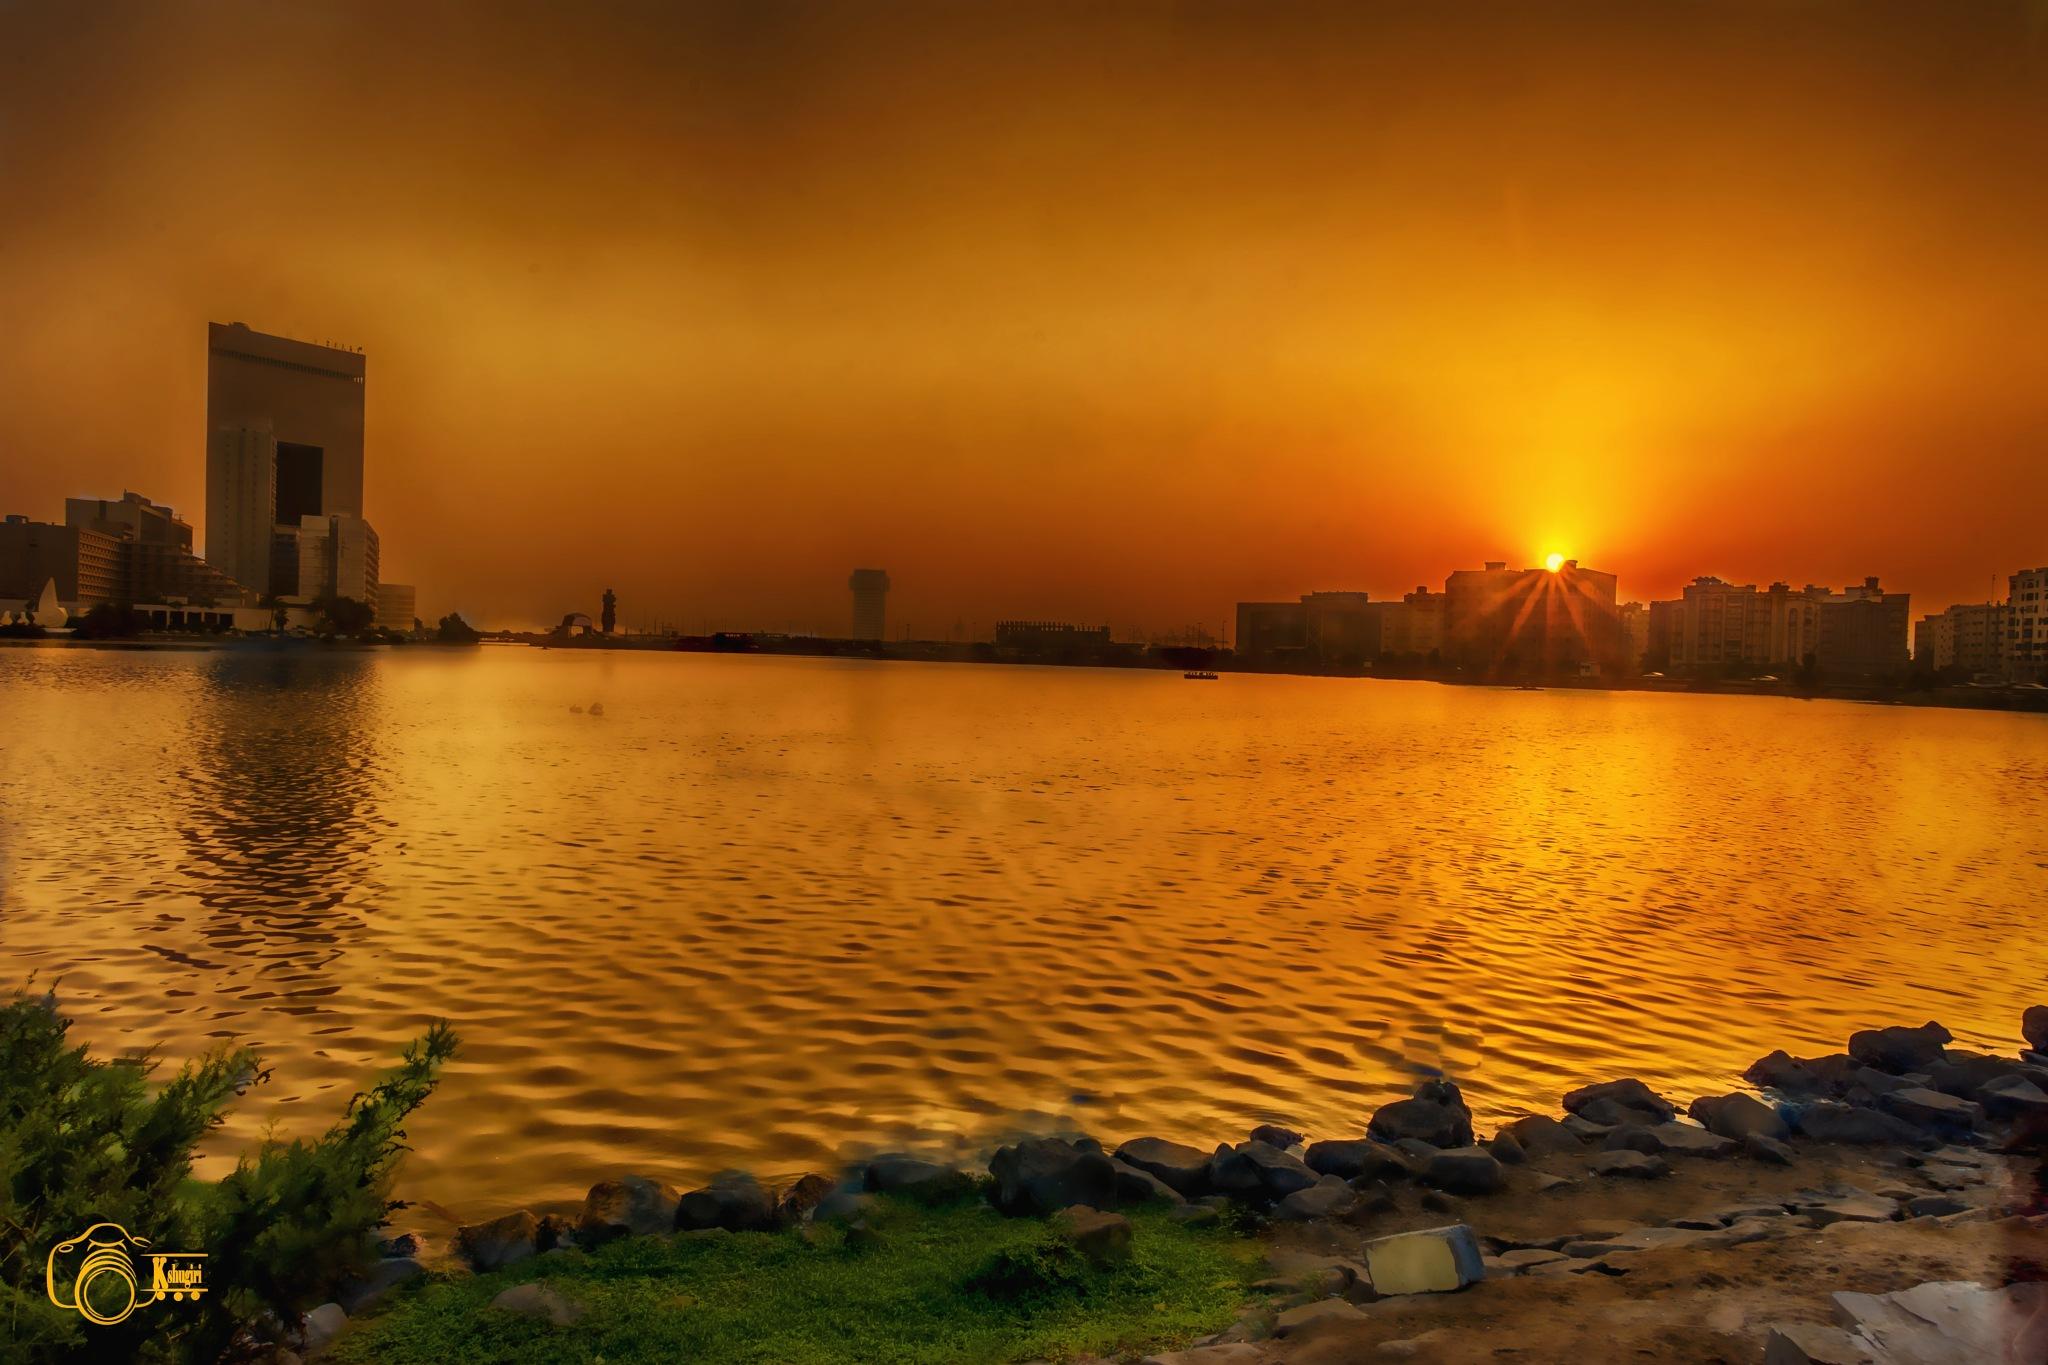 Sunset in jeddah by shagroon